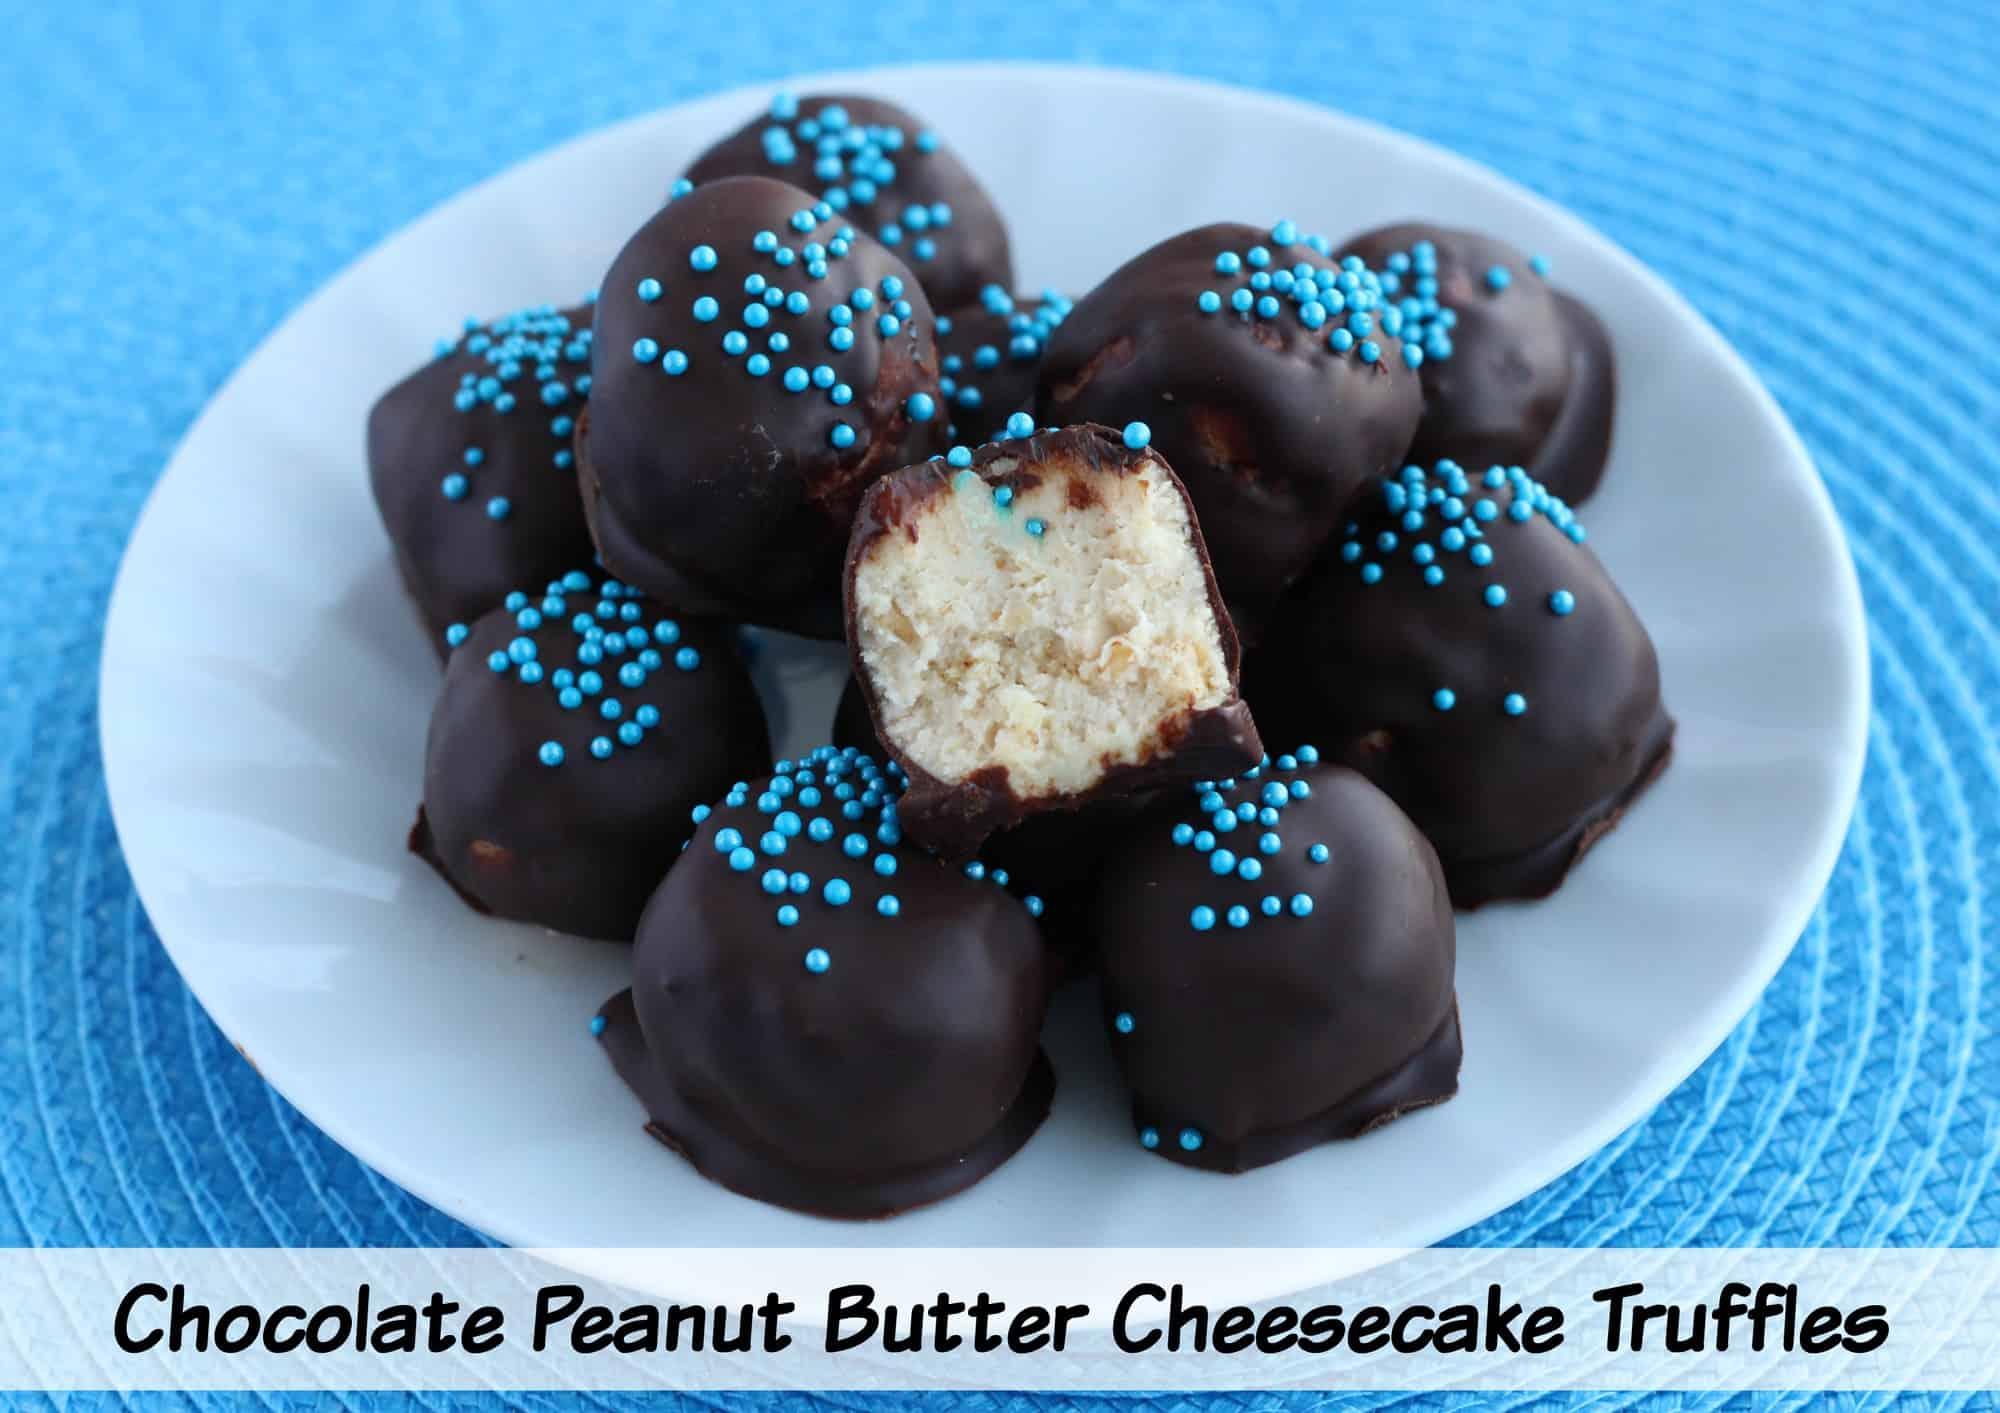 Easy Chocolate Peanut Butter Cheesecake Truffles Recipe